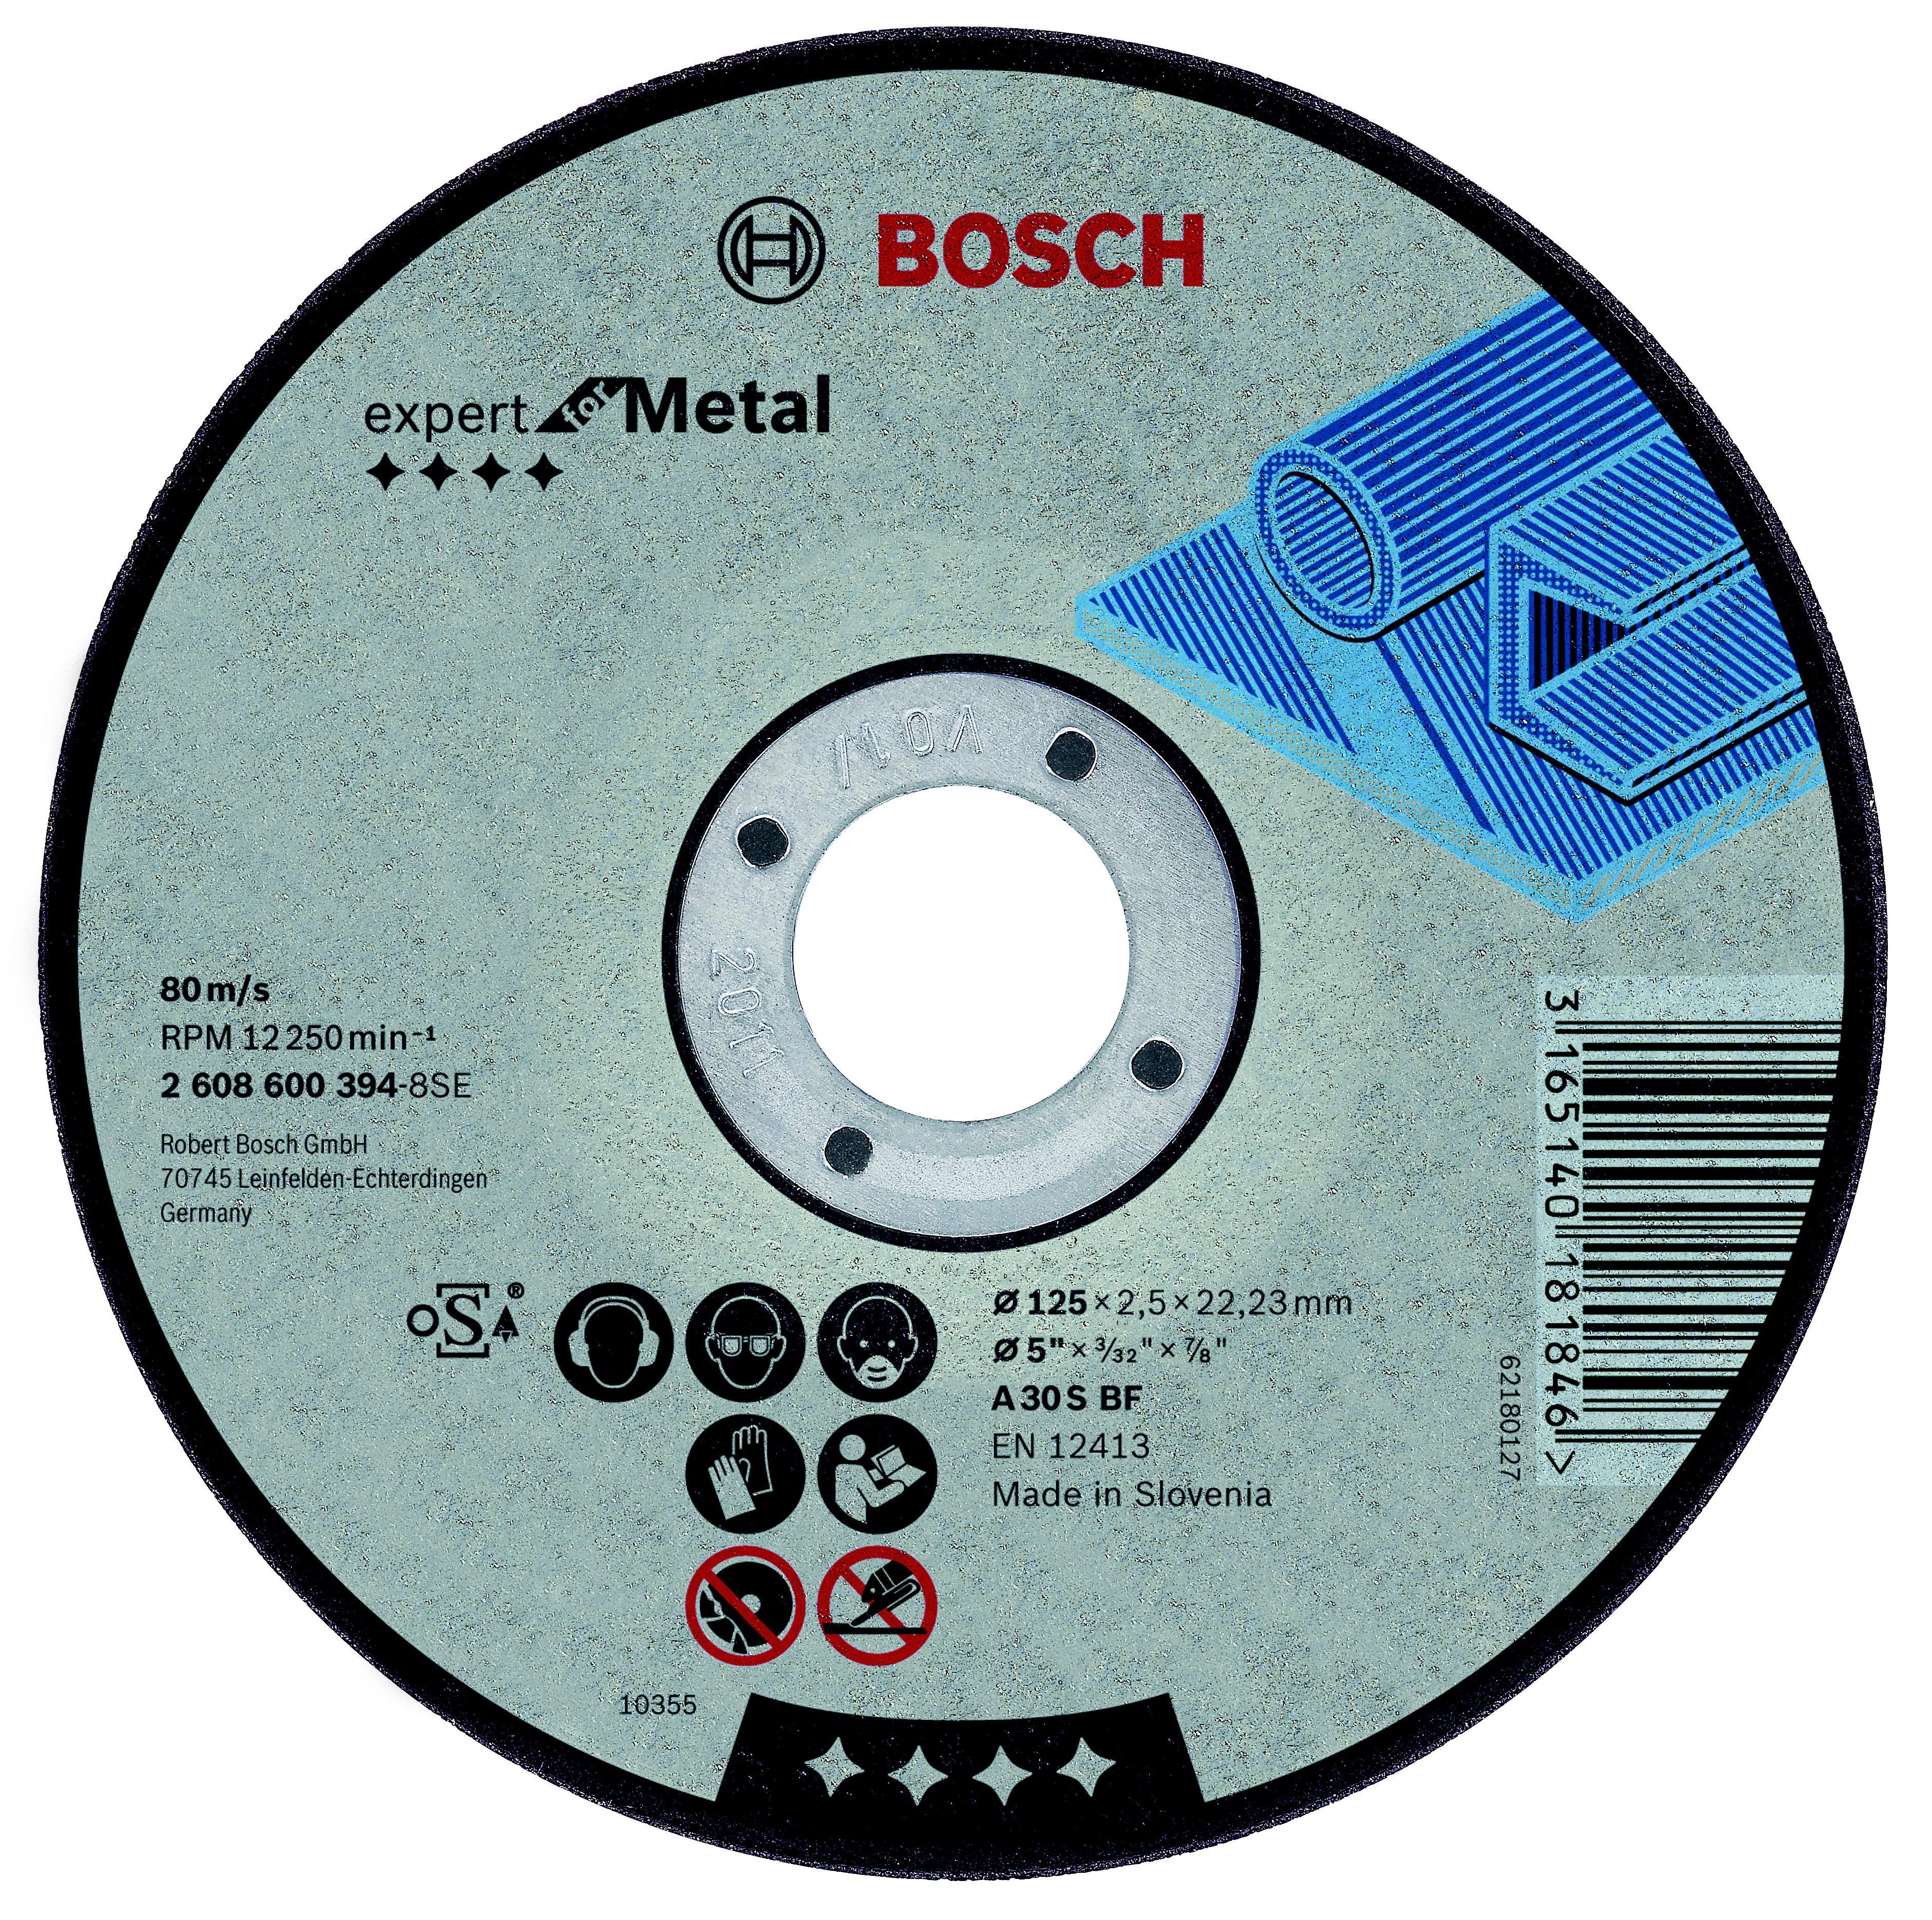 Фото 2/2 Expert for metal 150 Х 1,6 Х 22, Круг отрезной